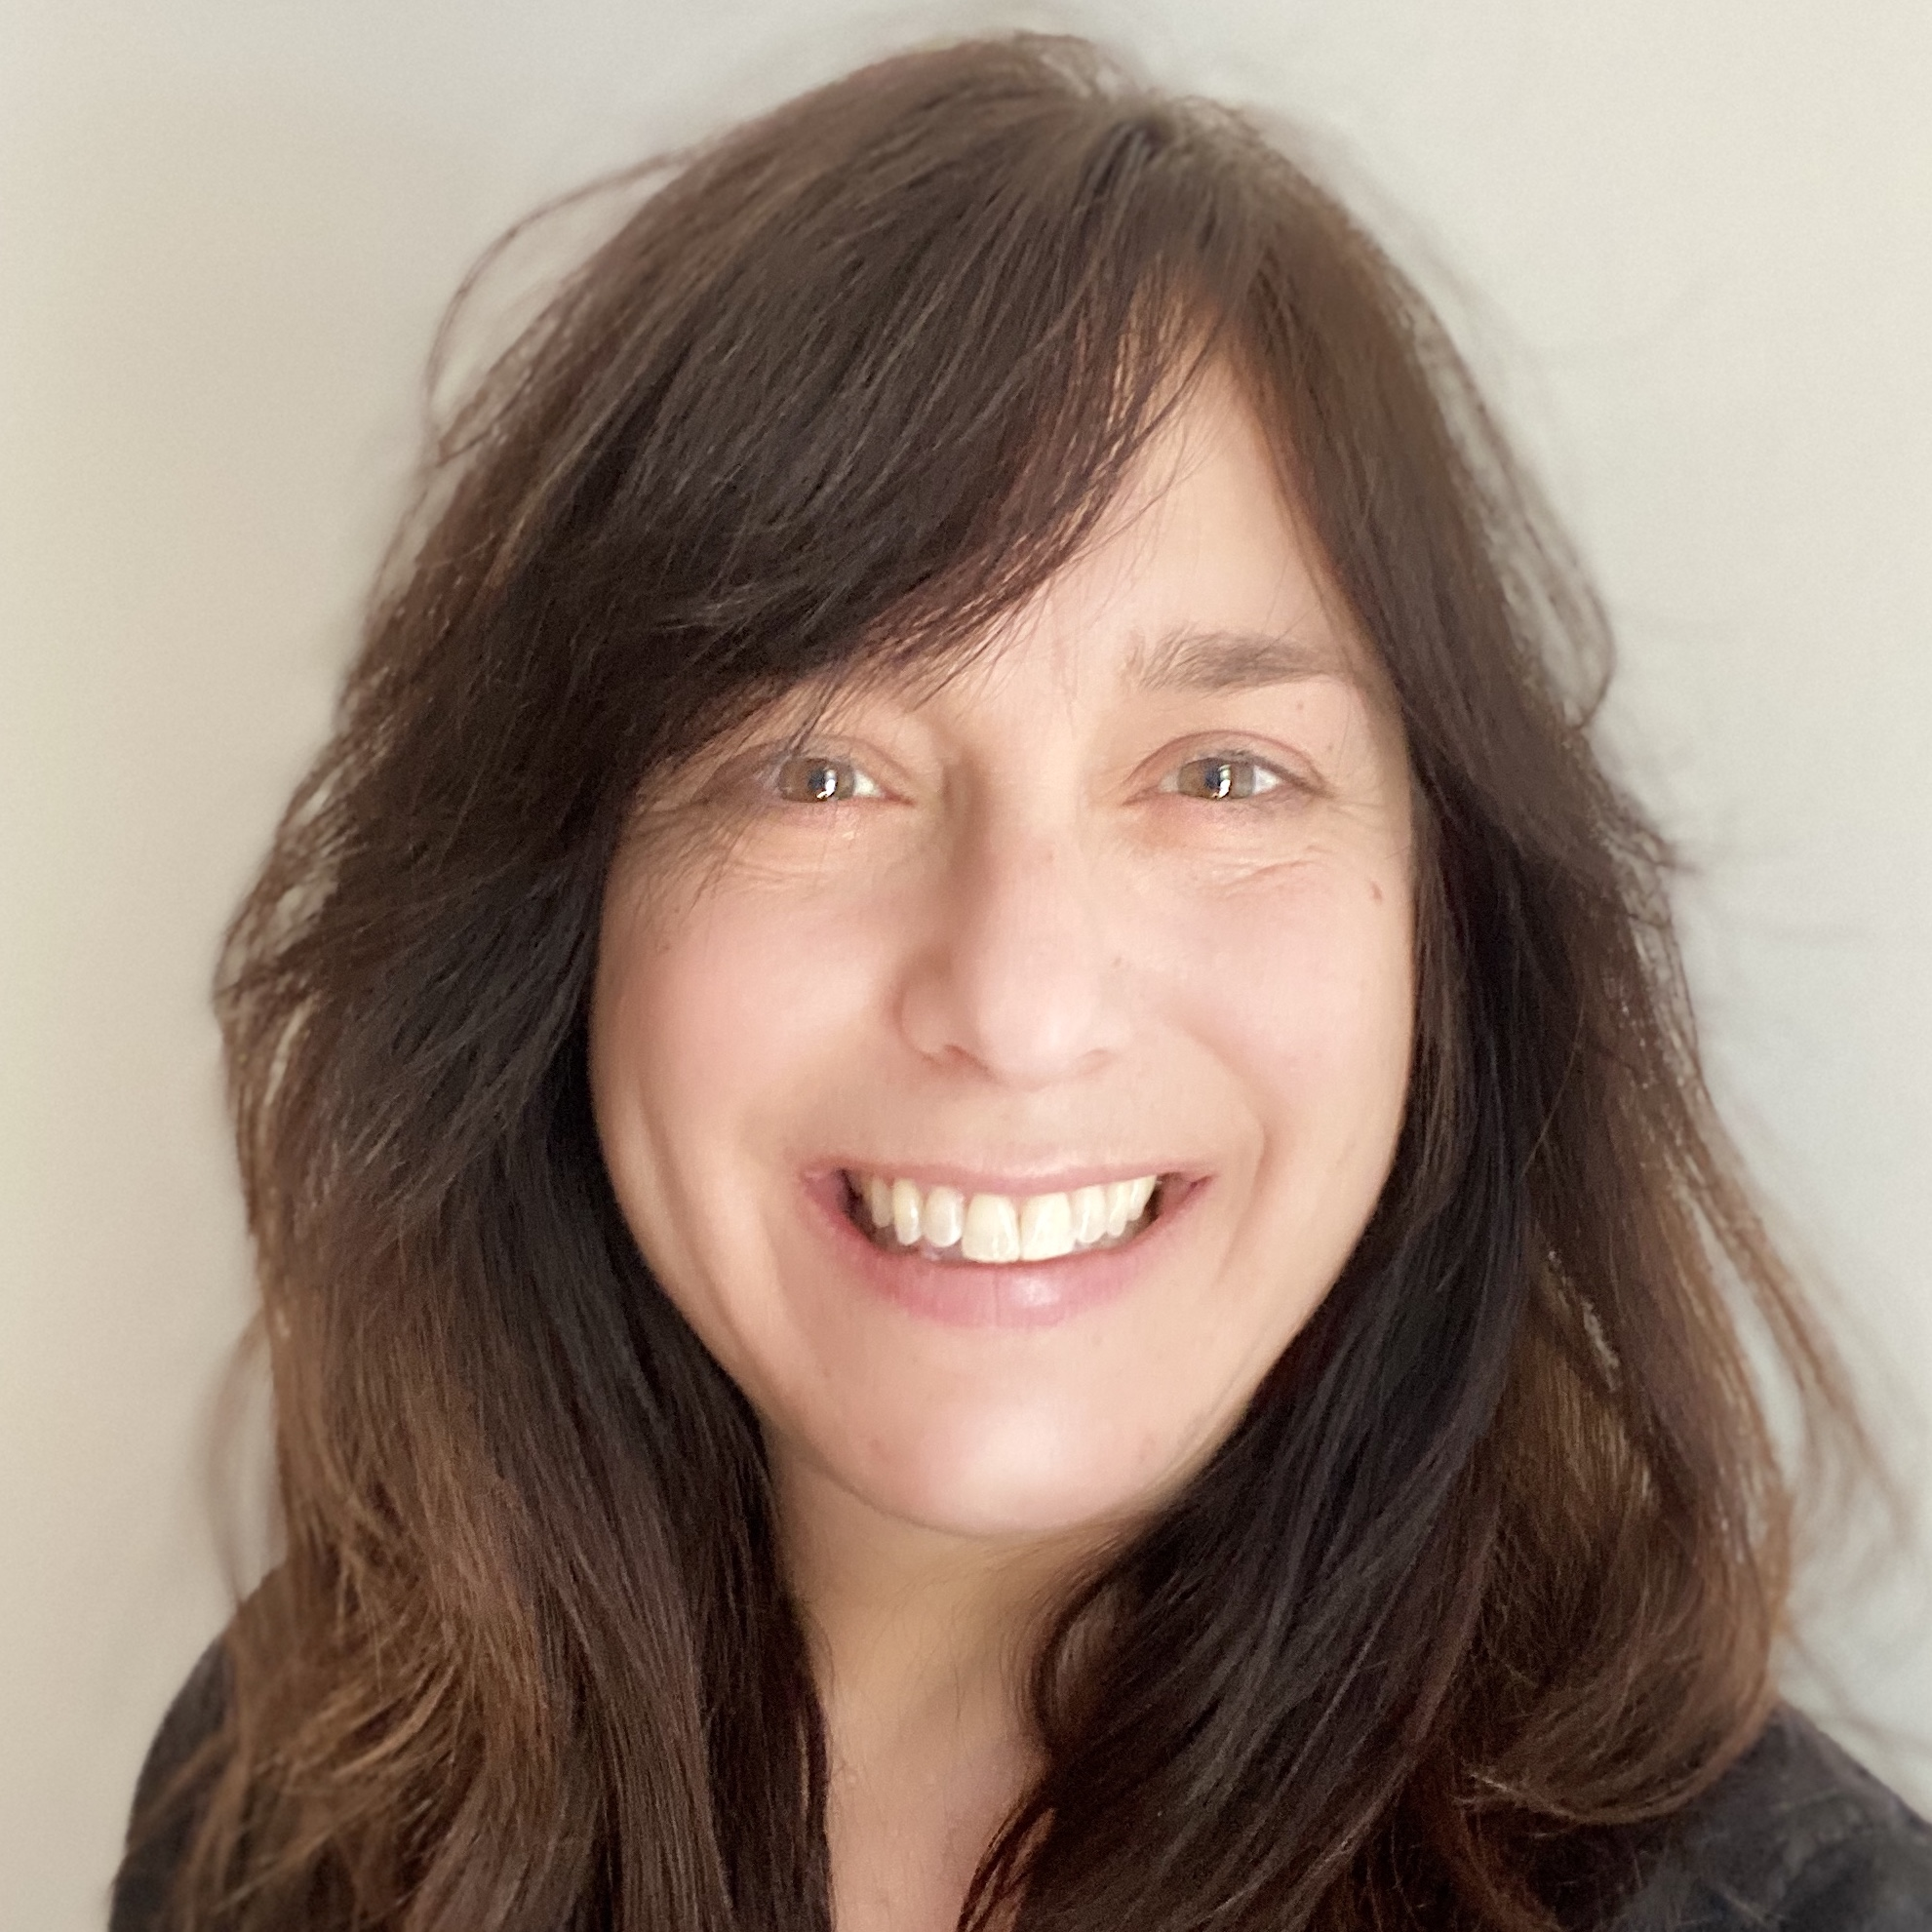 Pamela Teitelbaum